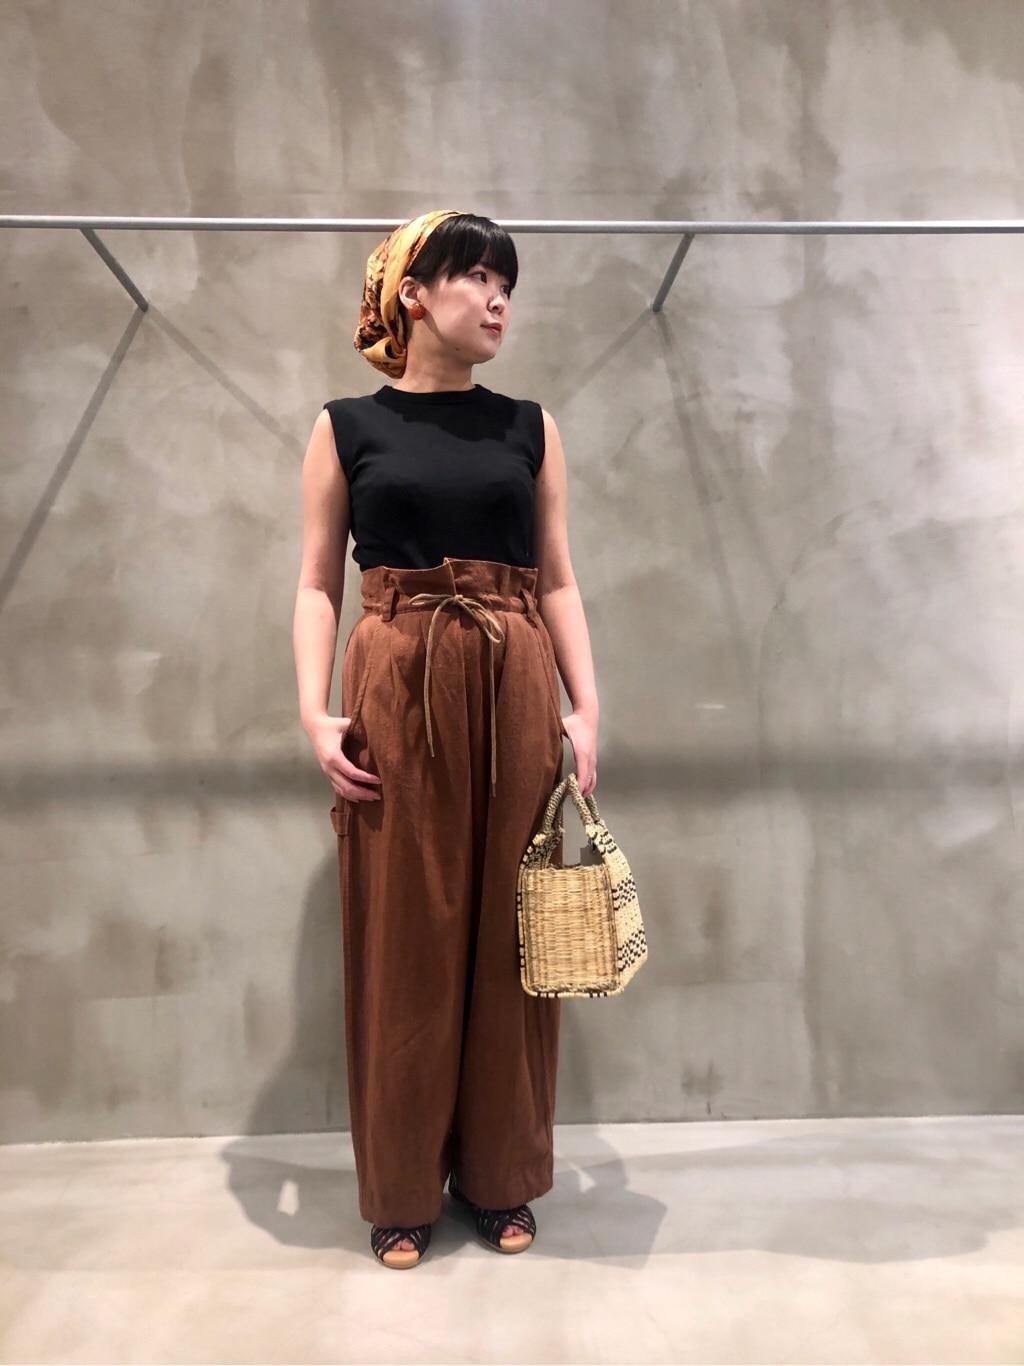 bulle de savon 渋谷スクランブルスクエア 身長:157cm 2020.04.11